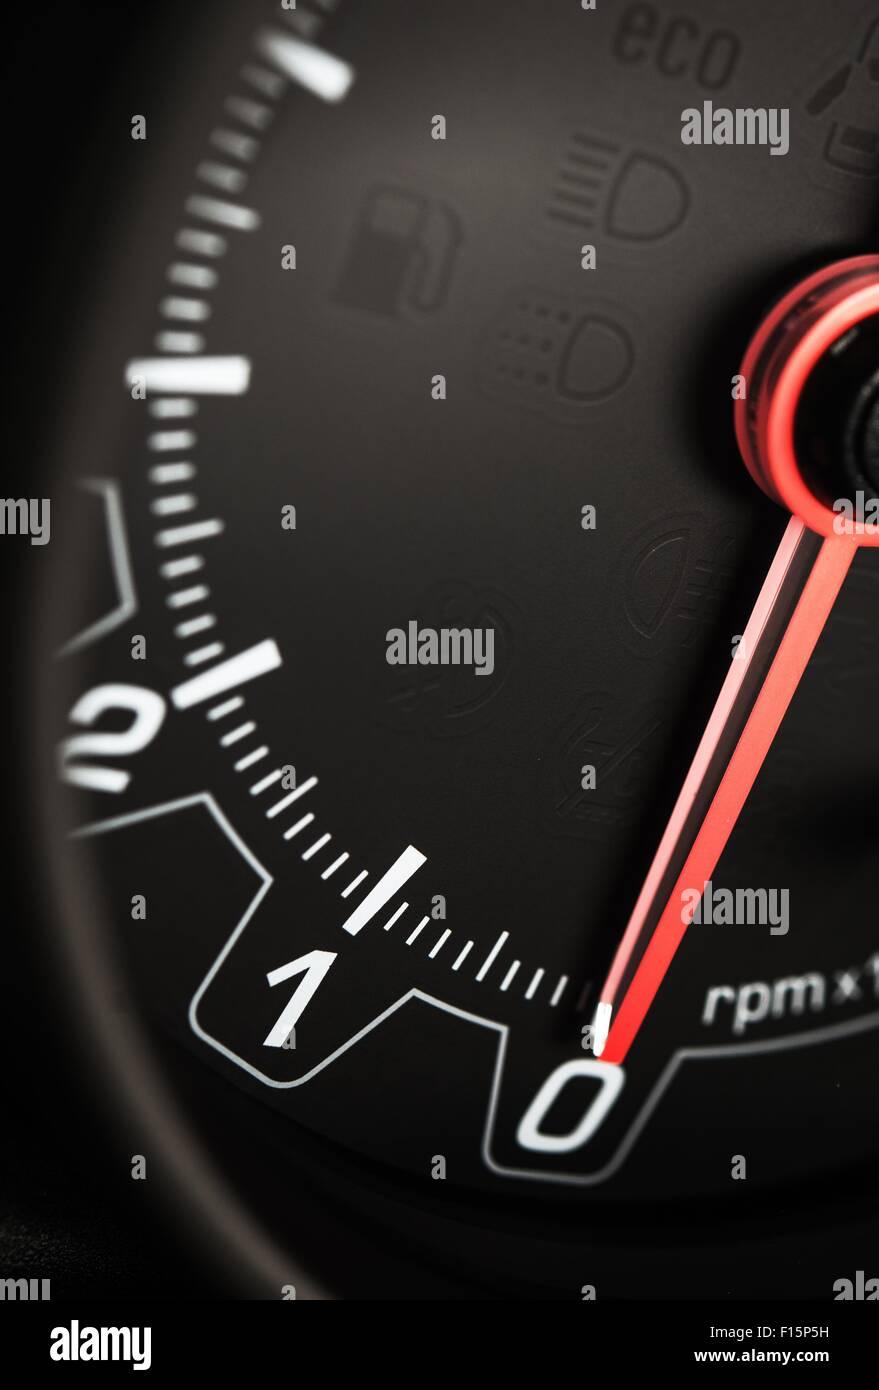 Schwarzes Auto Drehzahlmesser Nahaufnahme. Schuss pro Minute Tacho. Auto-Technologien. Stockbild